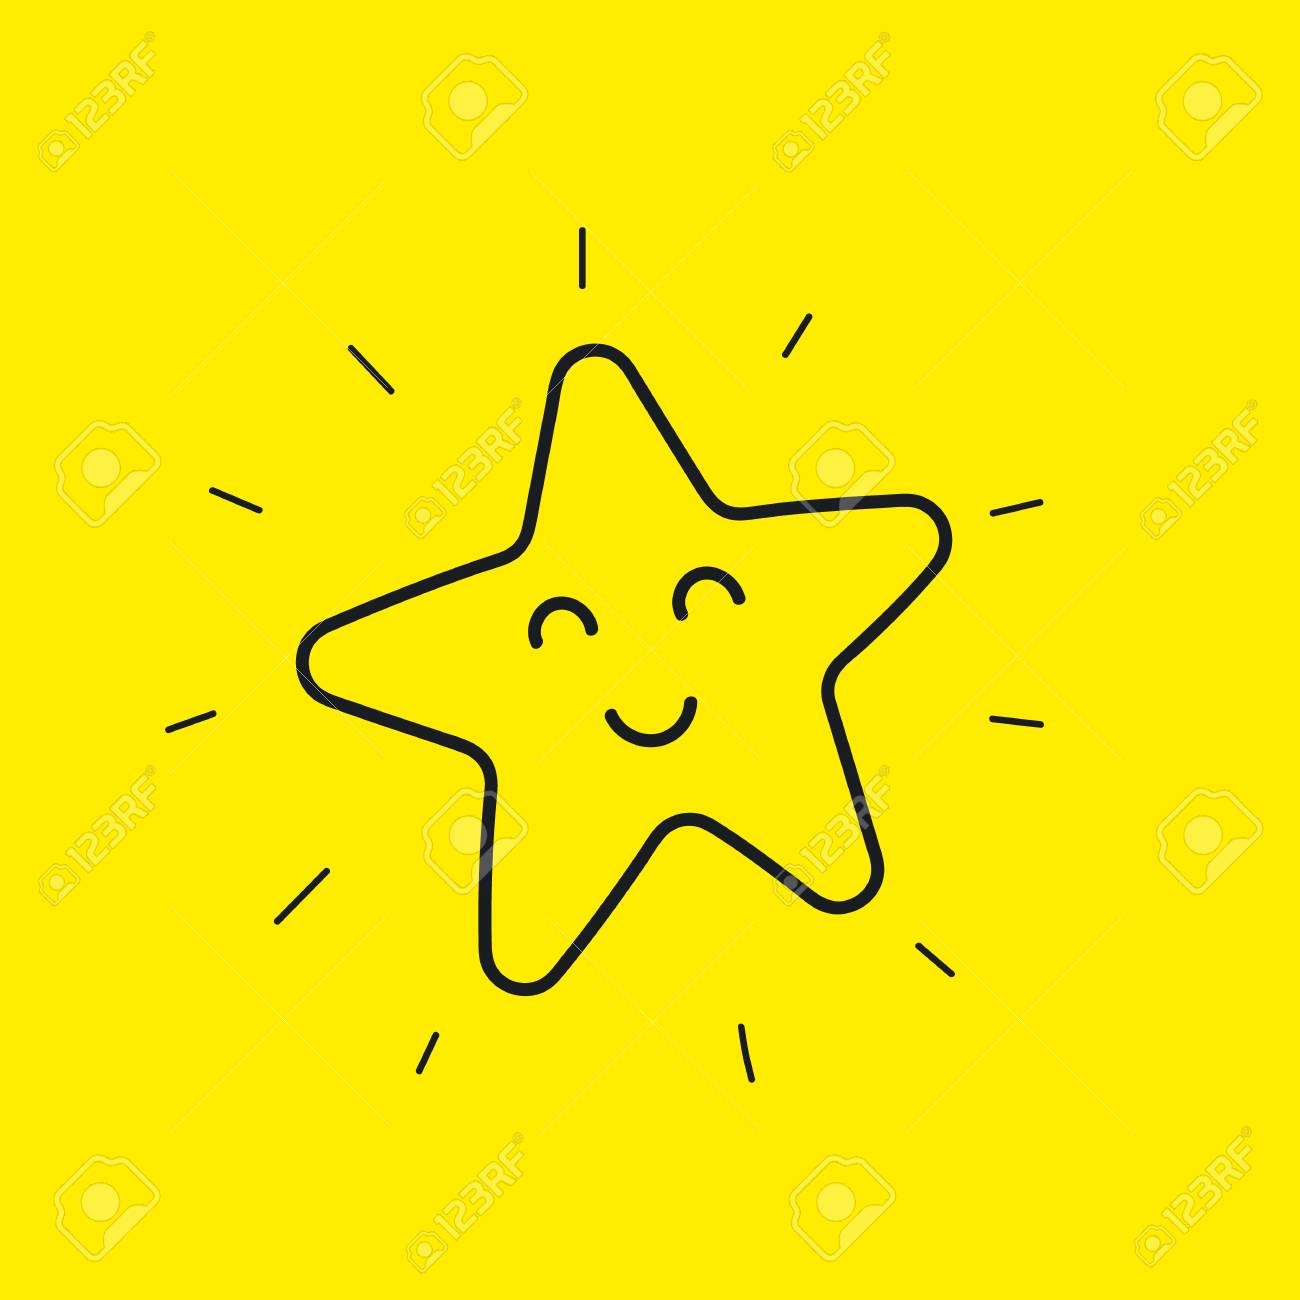 Star line outline icon best argumentative essay topics friendship essay happy star smiley hand drawn line icon good day isolated on 74807977 happy star smiley hand drawn line icon good day isolated on yellow happy flower emoji sciox Gallery